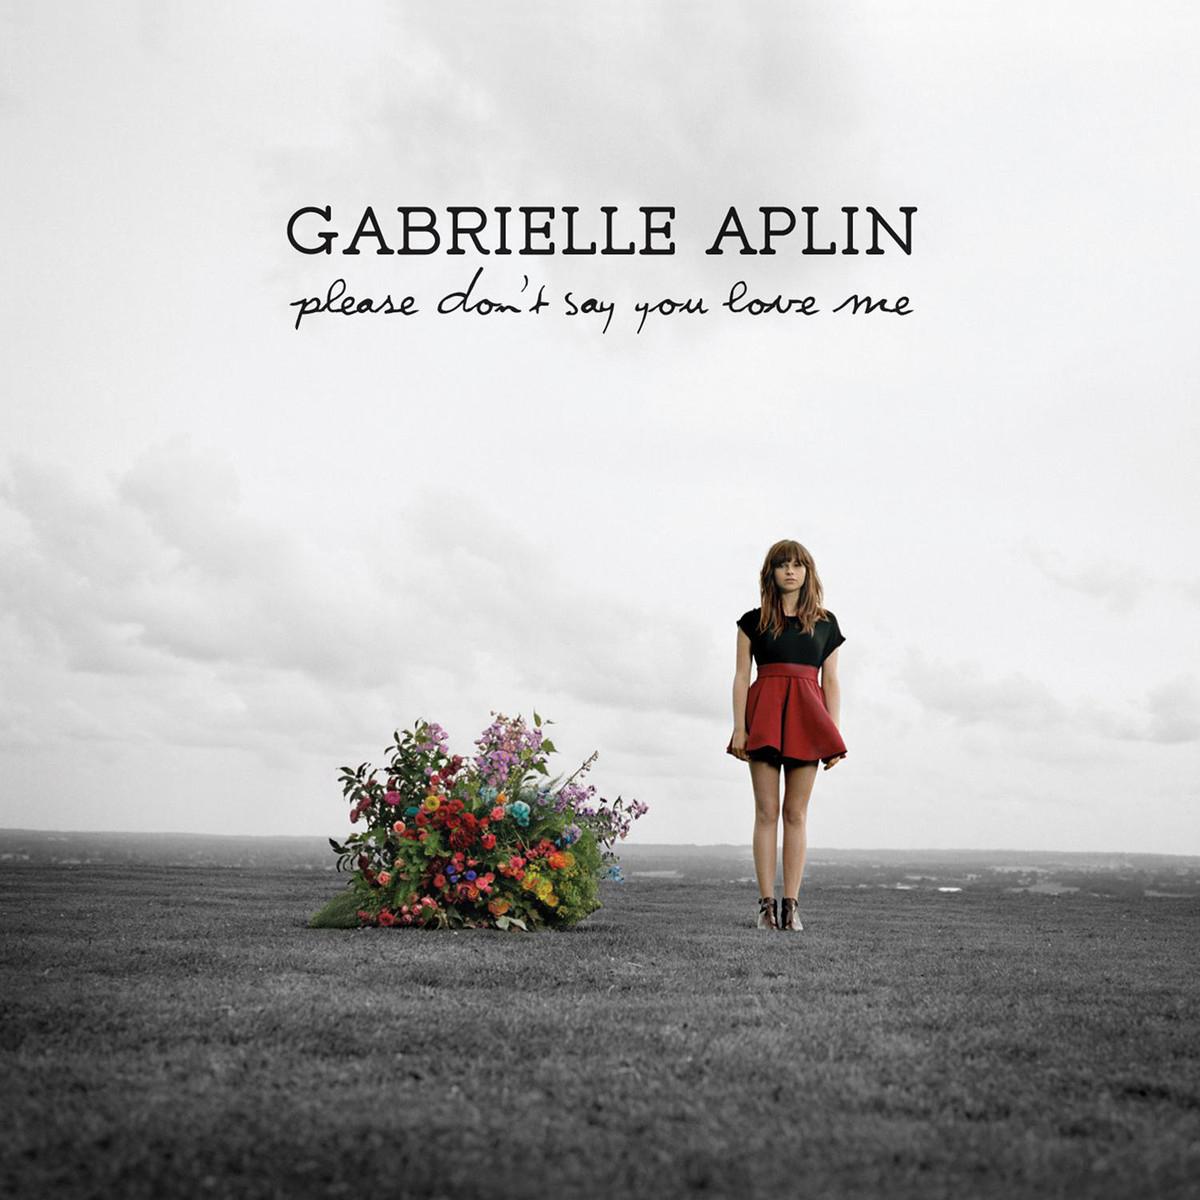 Chanson de Gabrielle Alpin gratuite